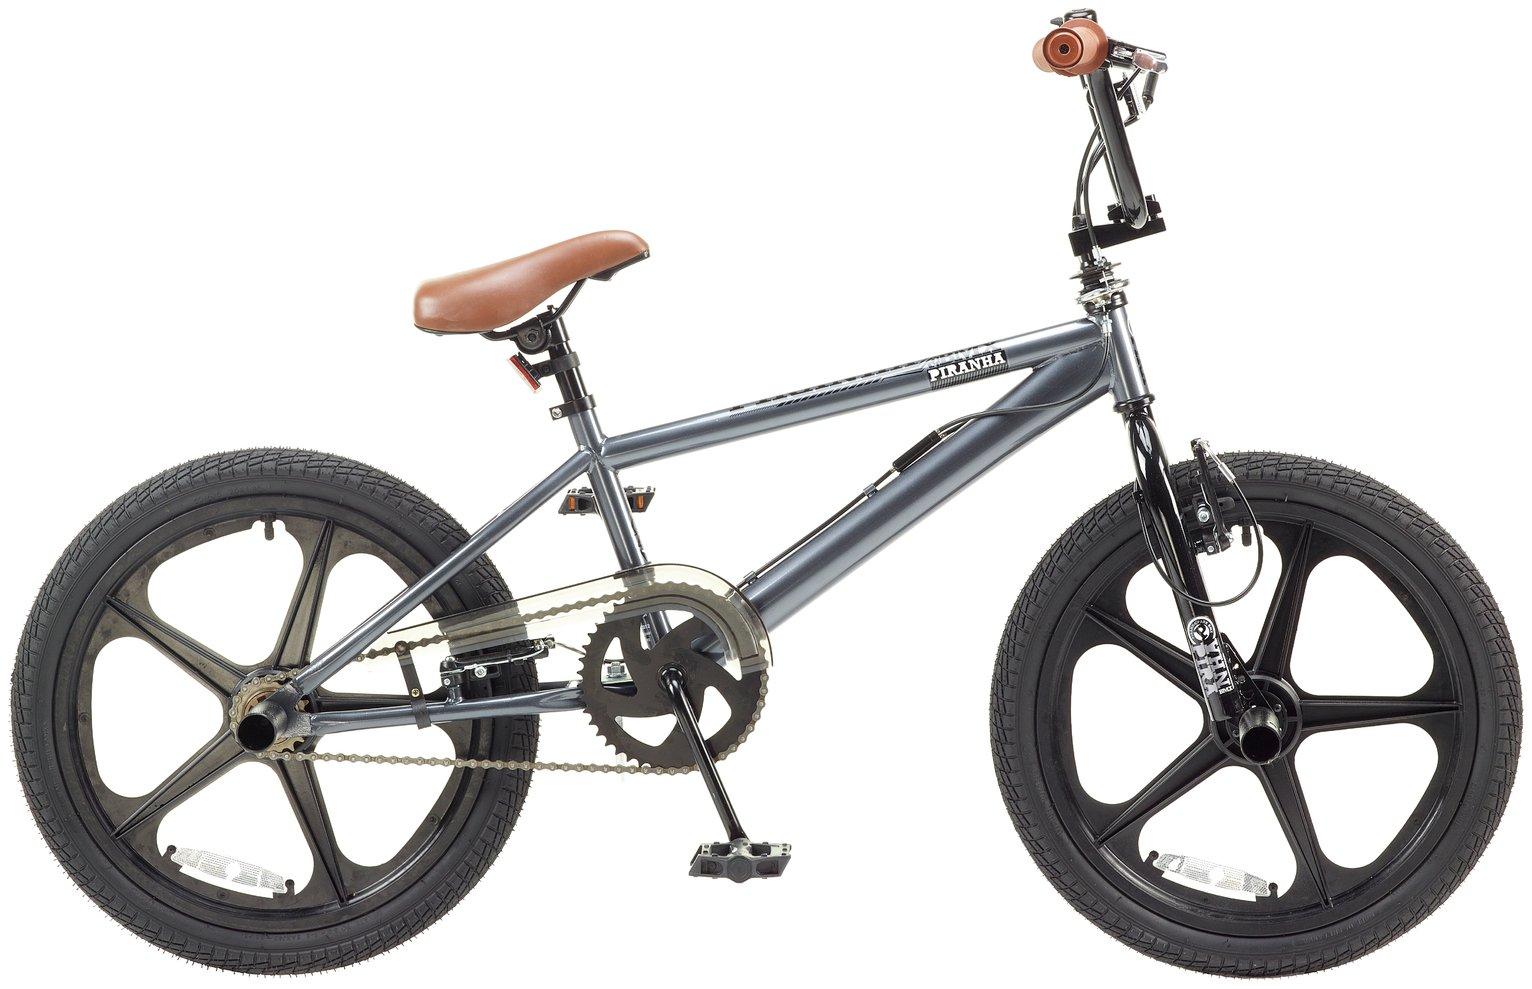 Piranha 20 Inch No Mercy SKYWAY BMX Bike